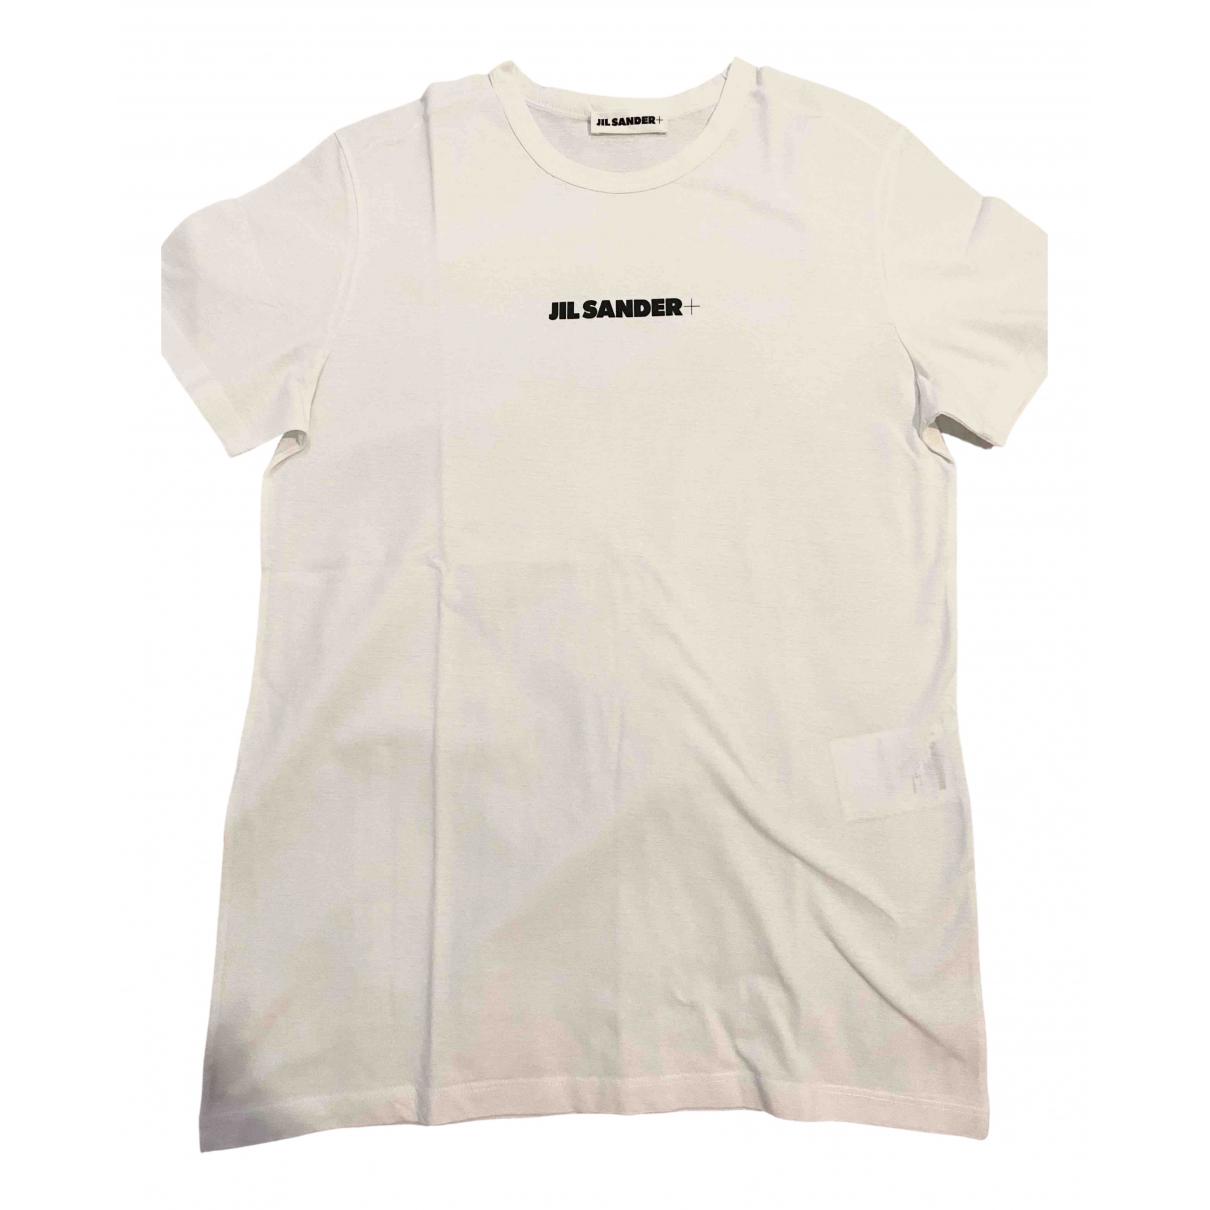 Jil Sander \N White Cotton T-shirts for Men S International